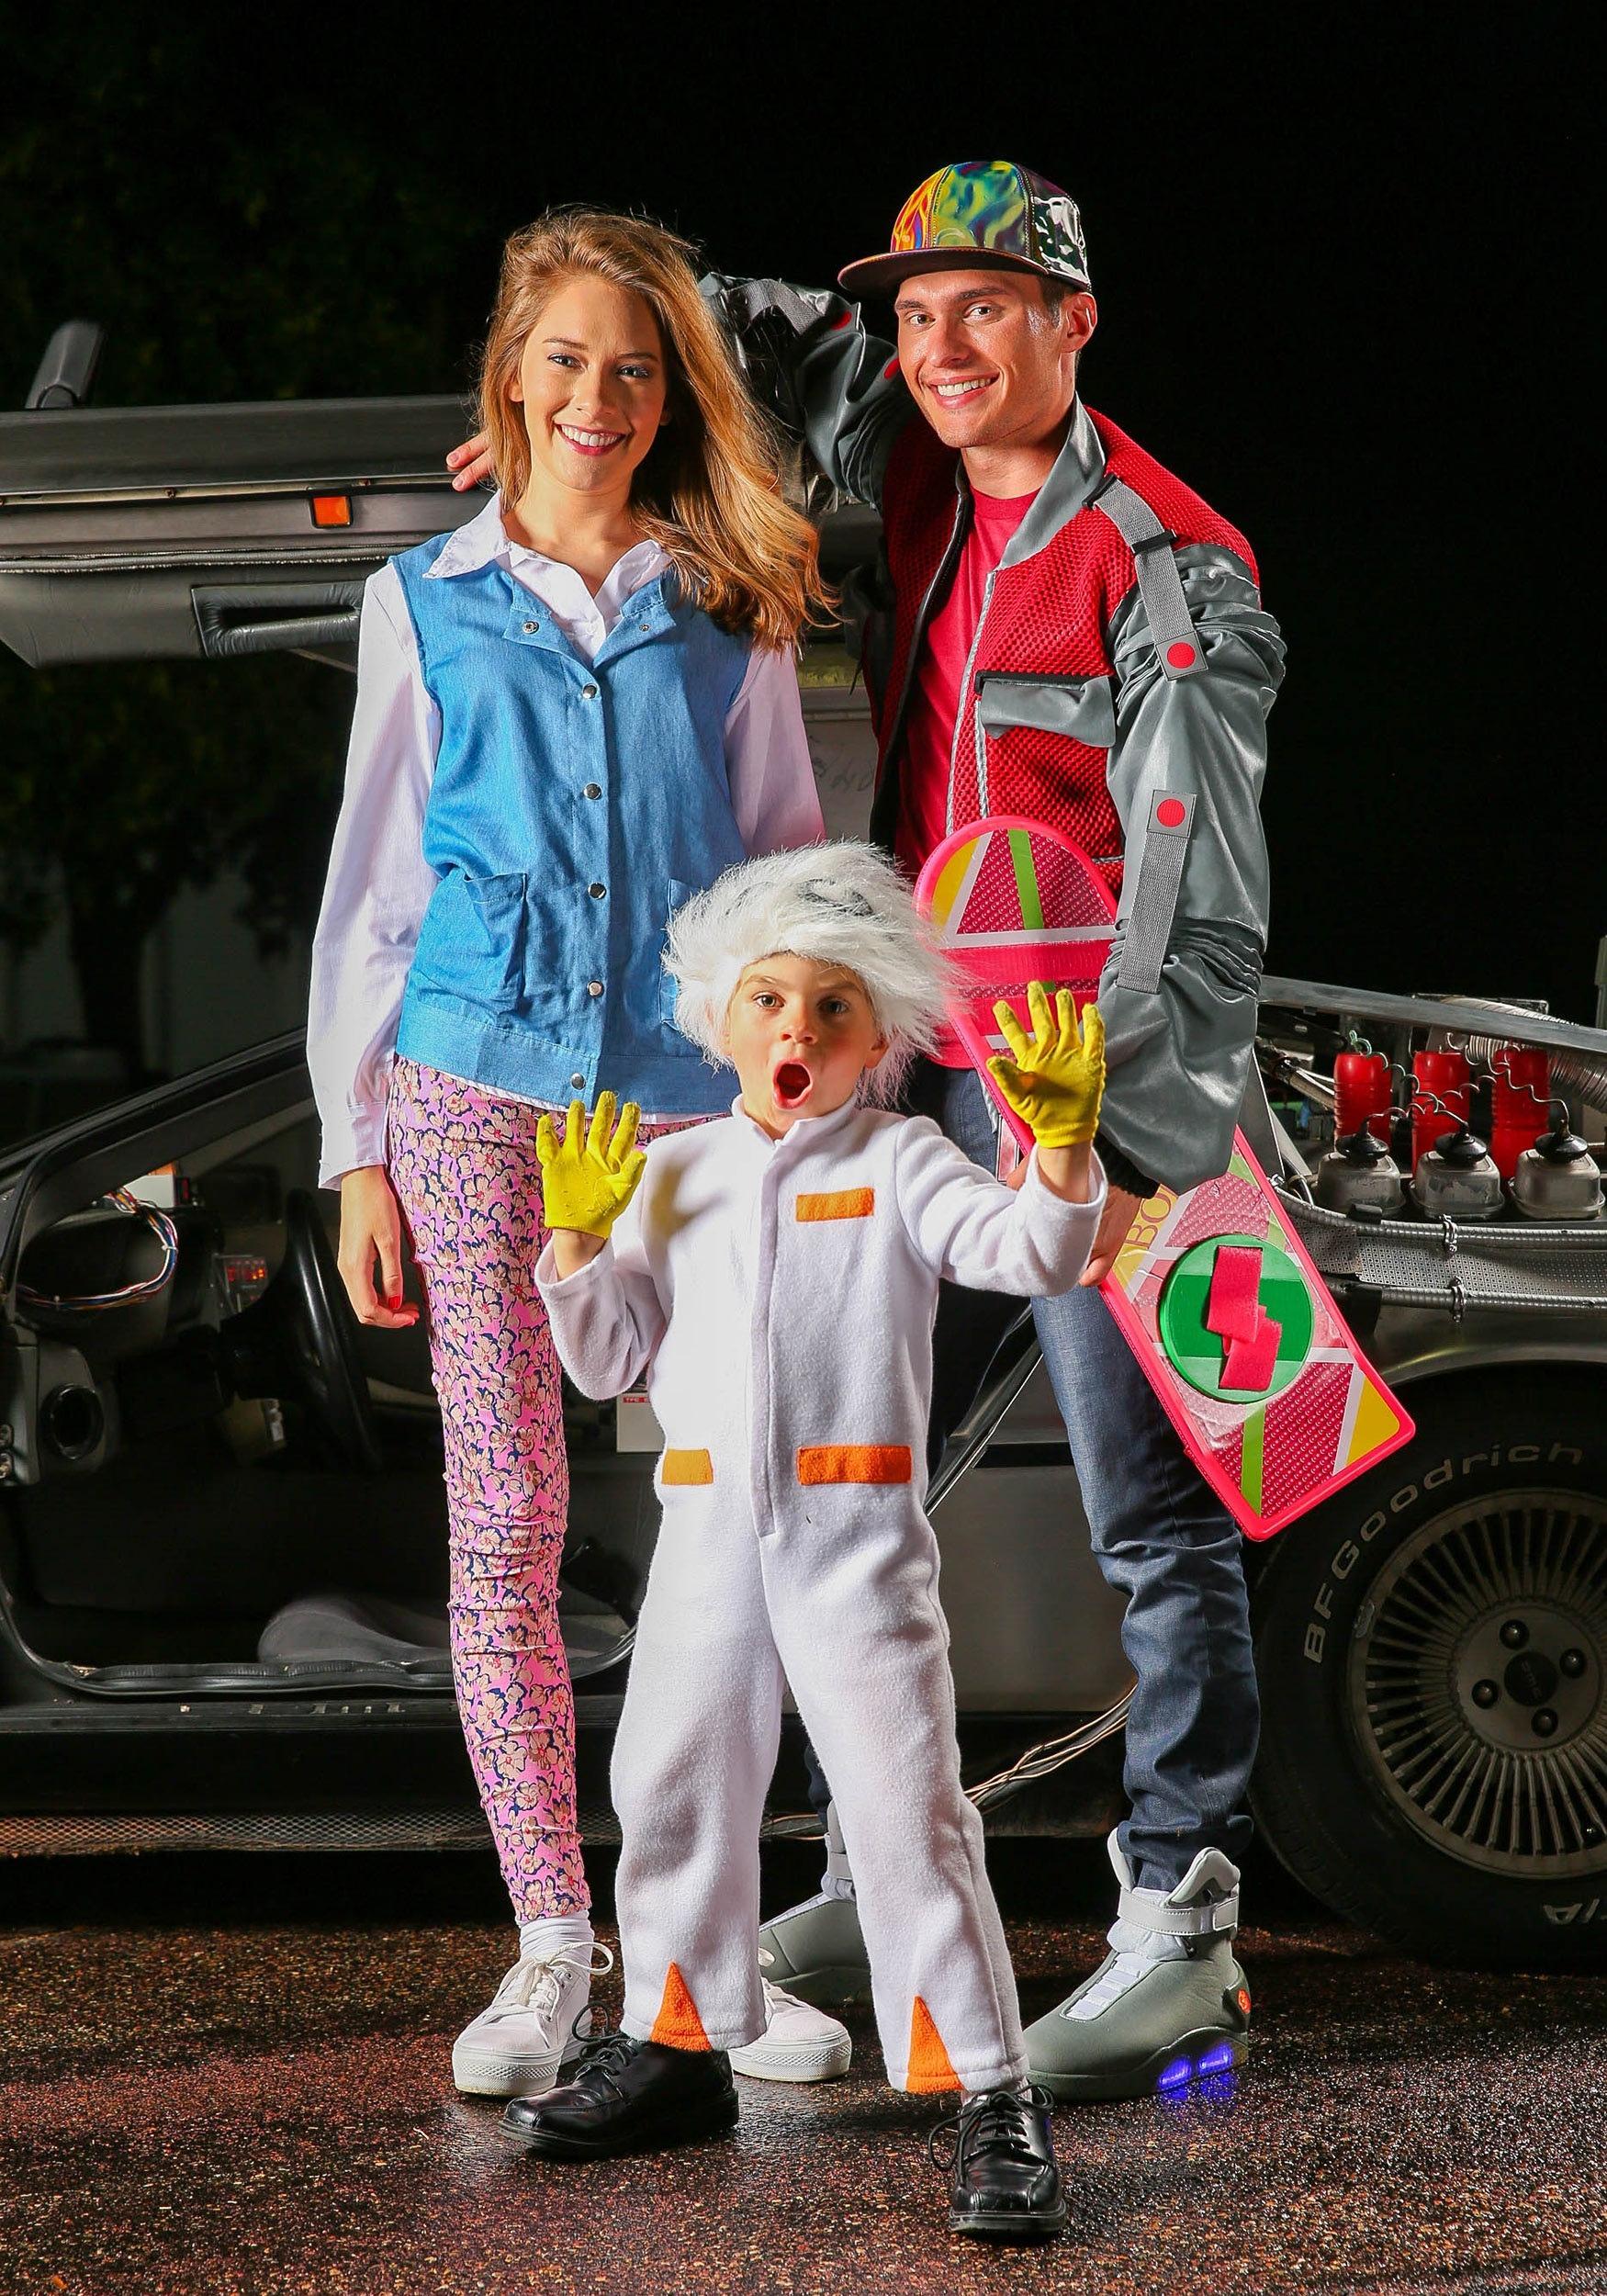 costume ideas for a uniform party